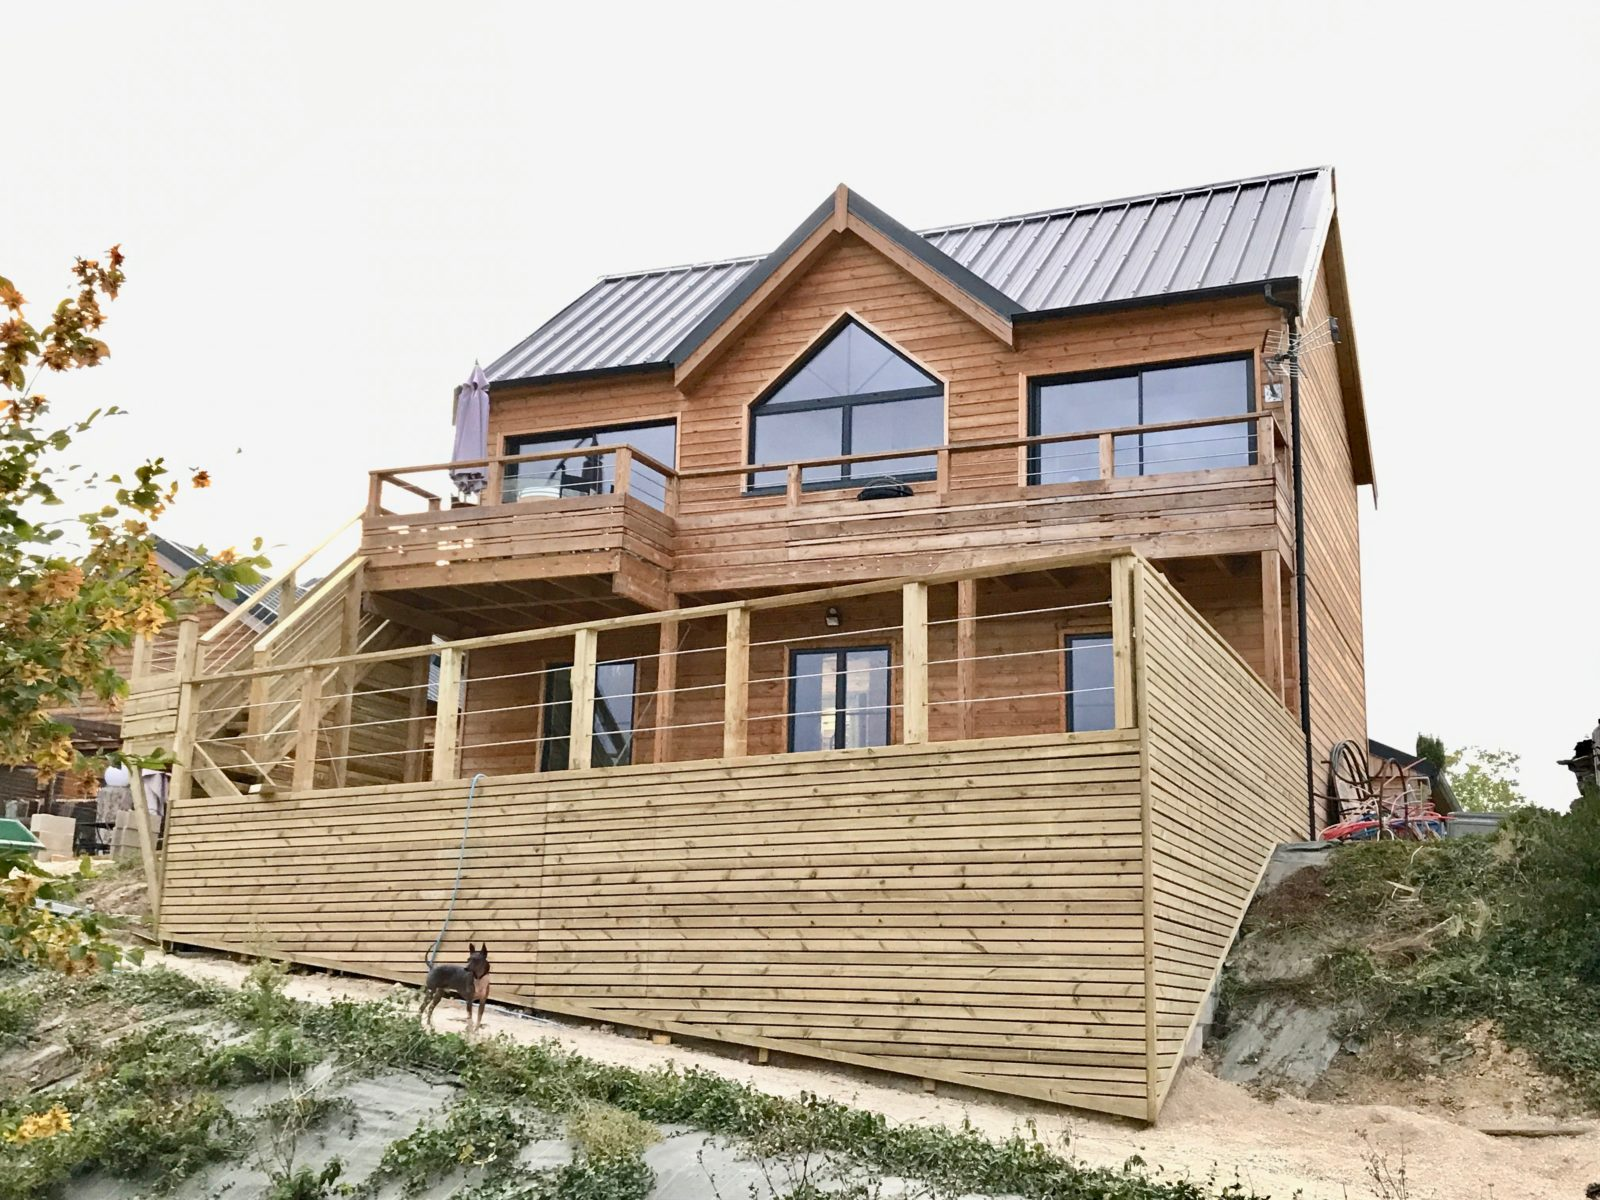 Maison type ranch avec terrasse